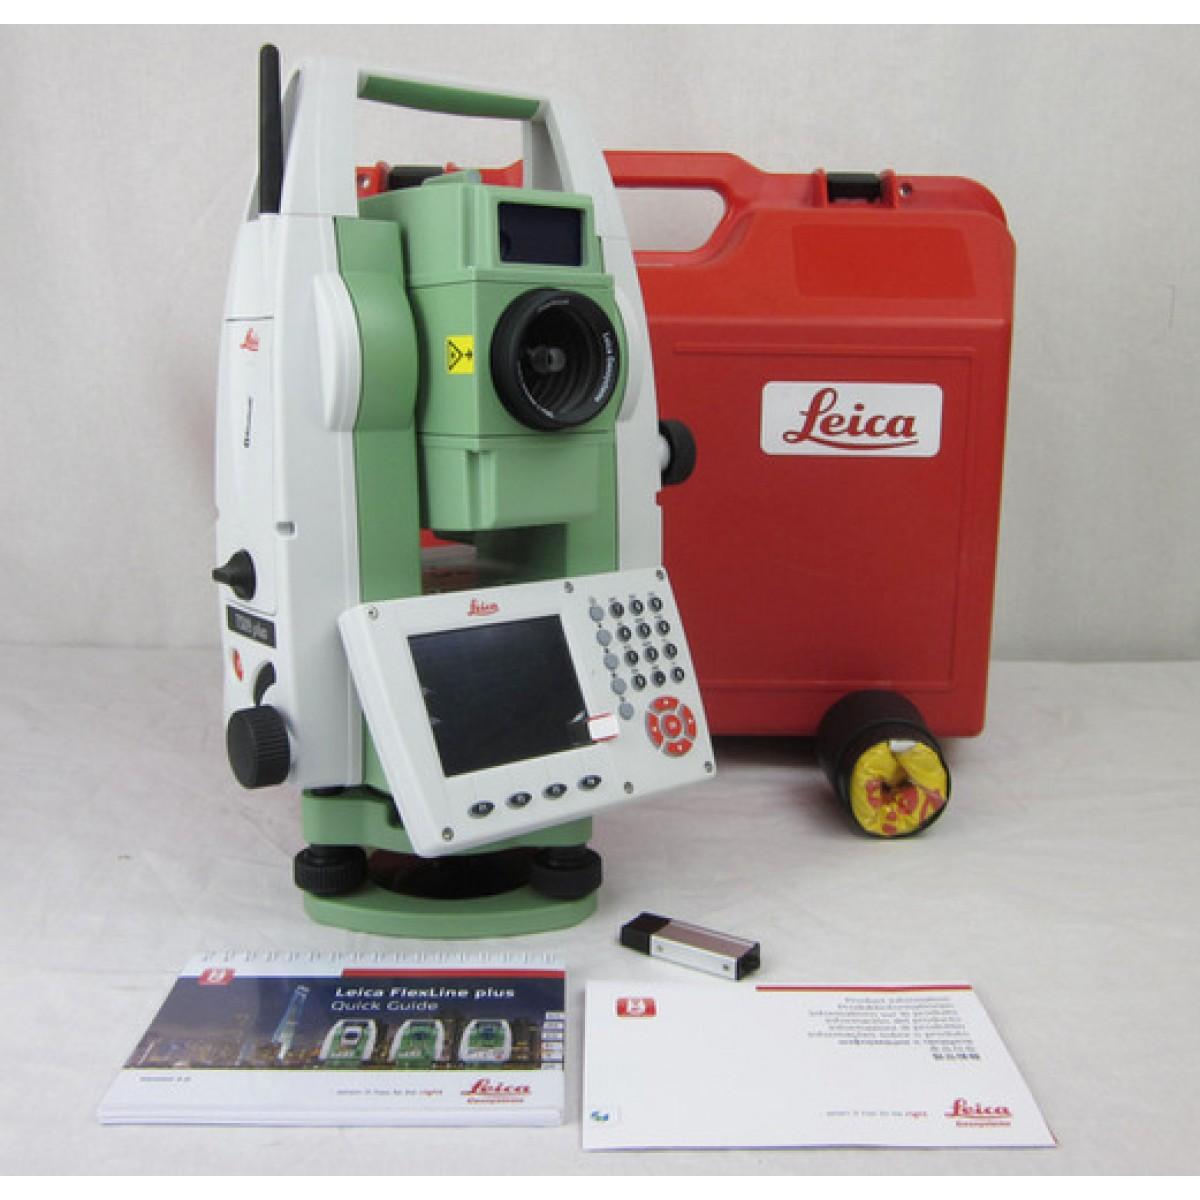 Leica Flexline Ts09plus Reflectorless Total Station